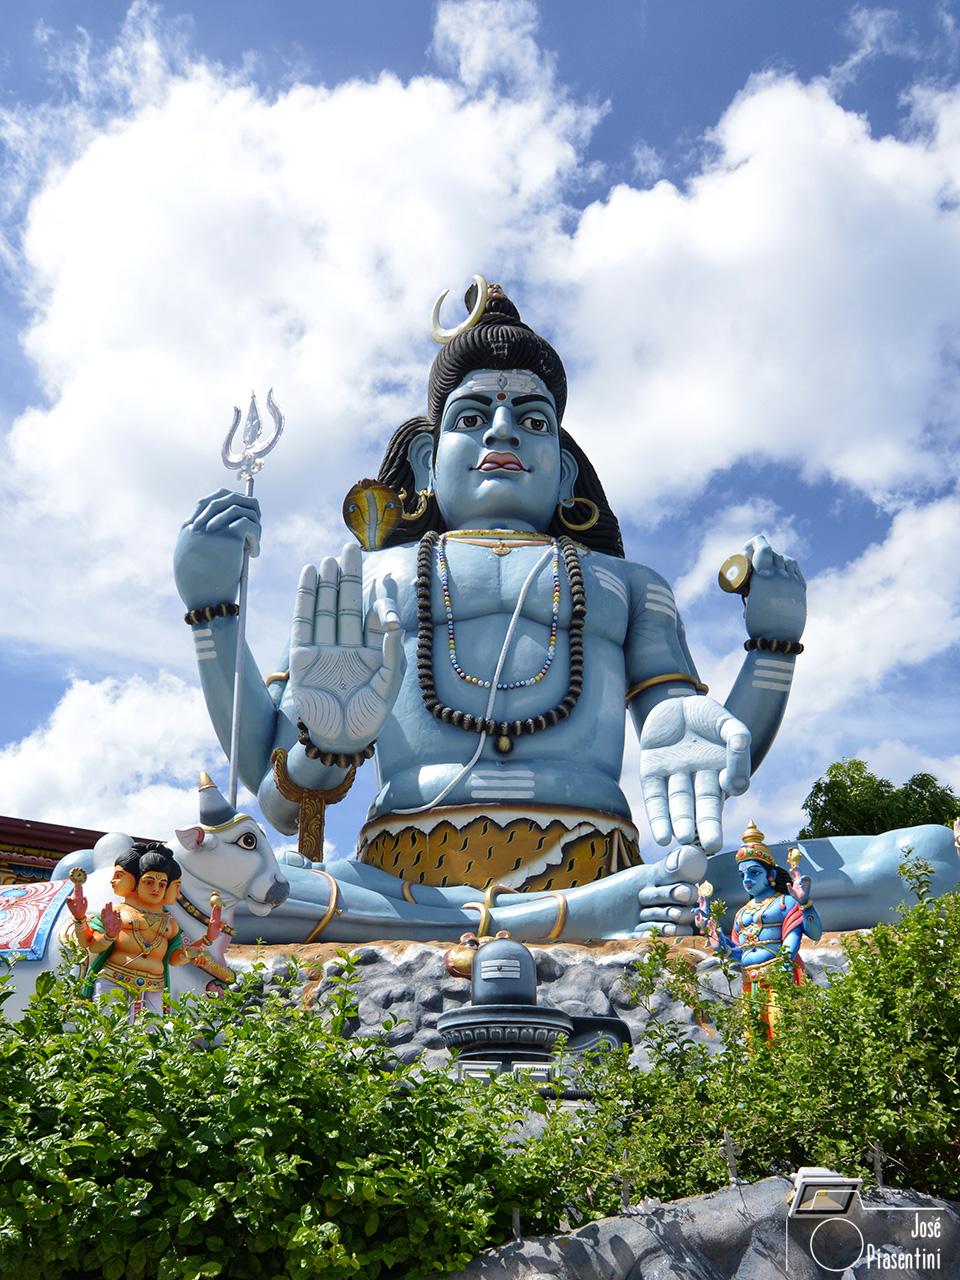 Budha outside Koneswaram temple